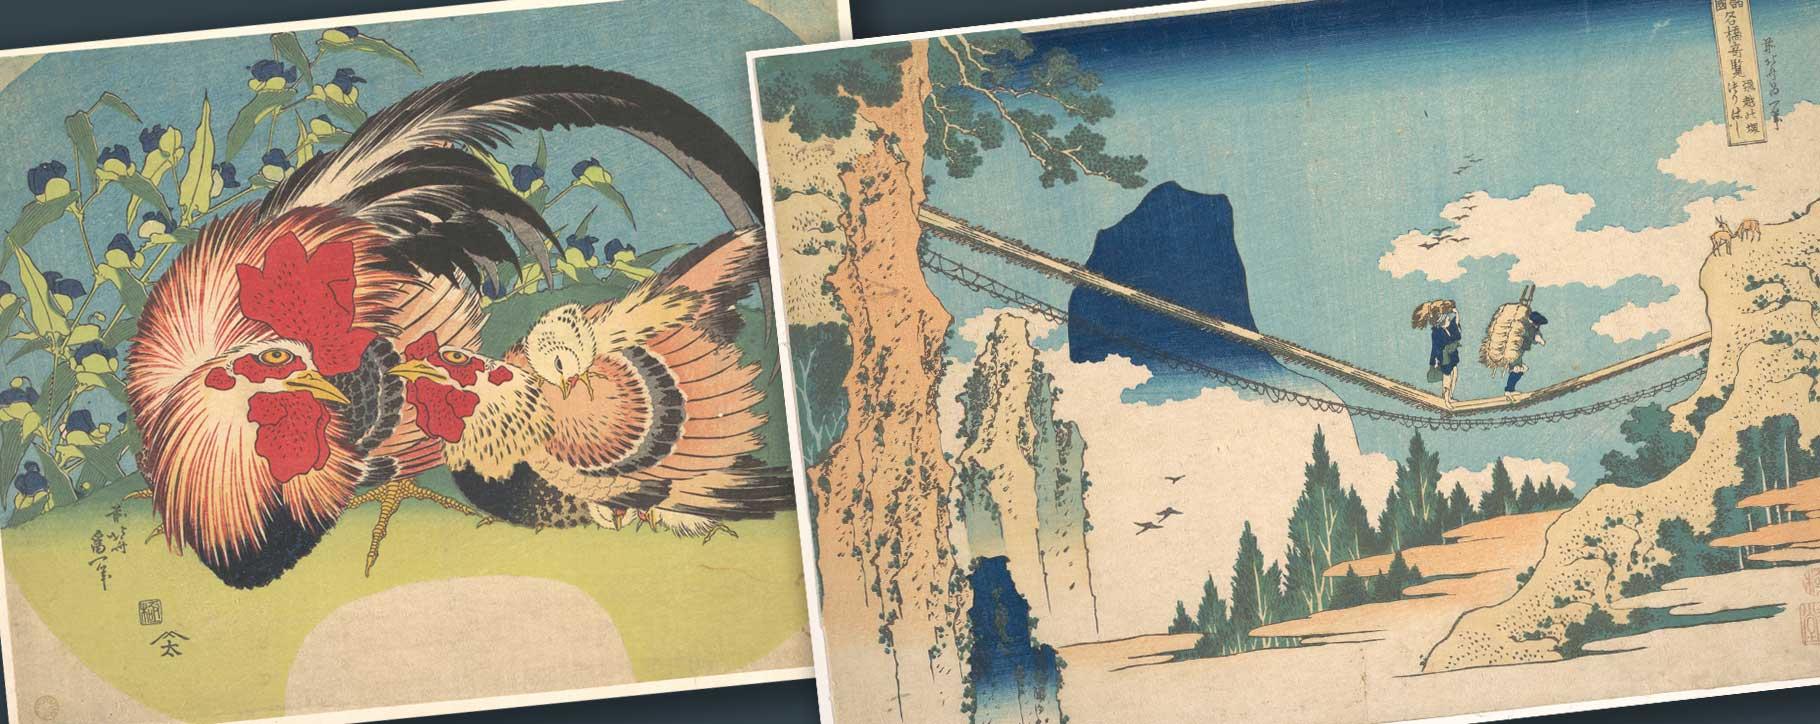 japan chickens and bridge prints